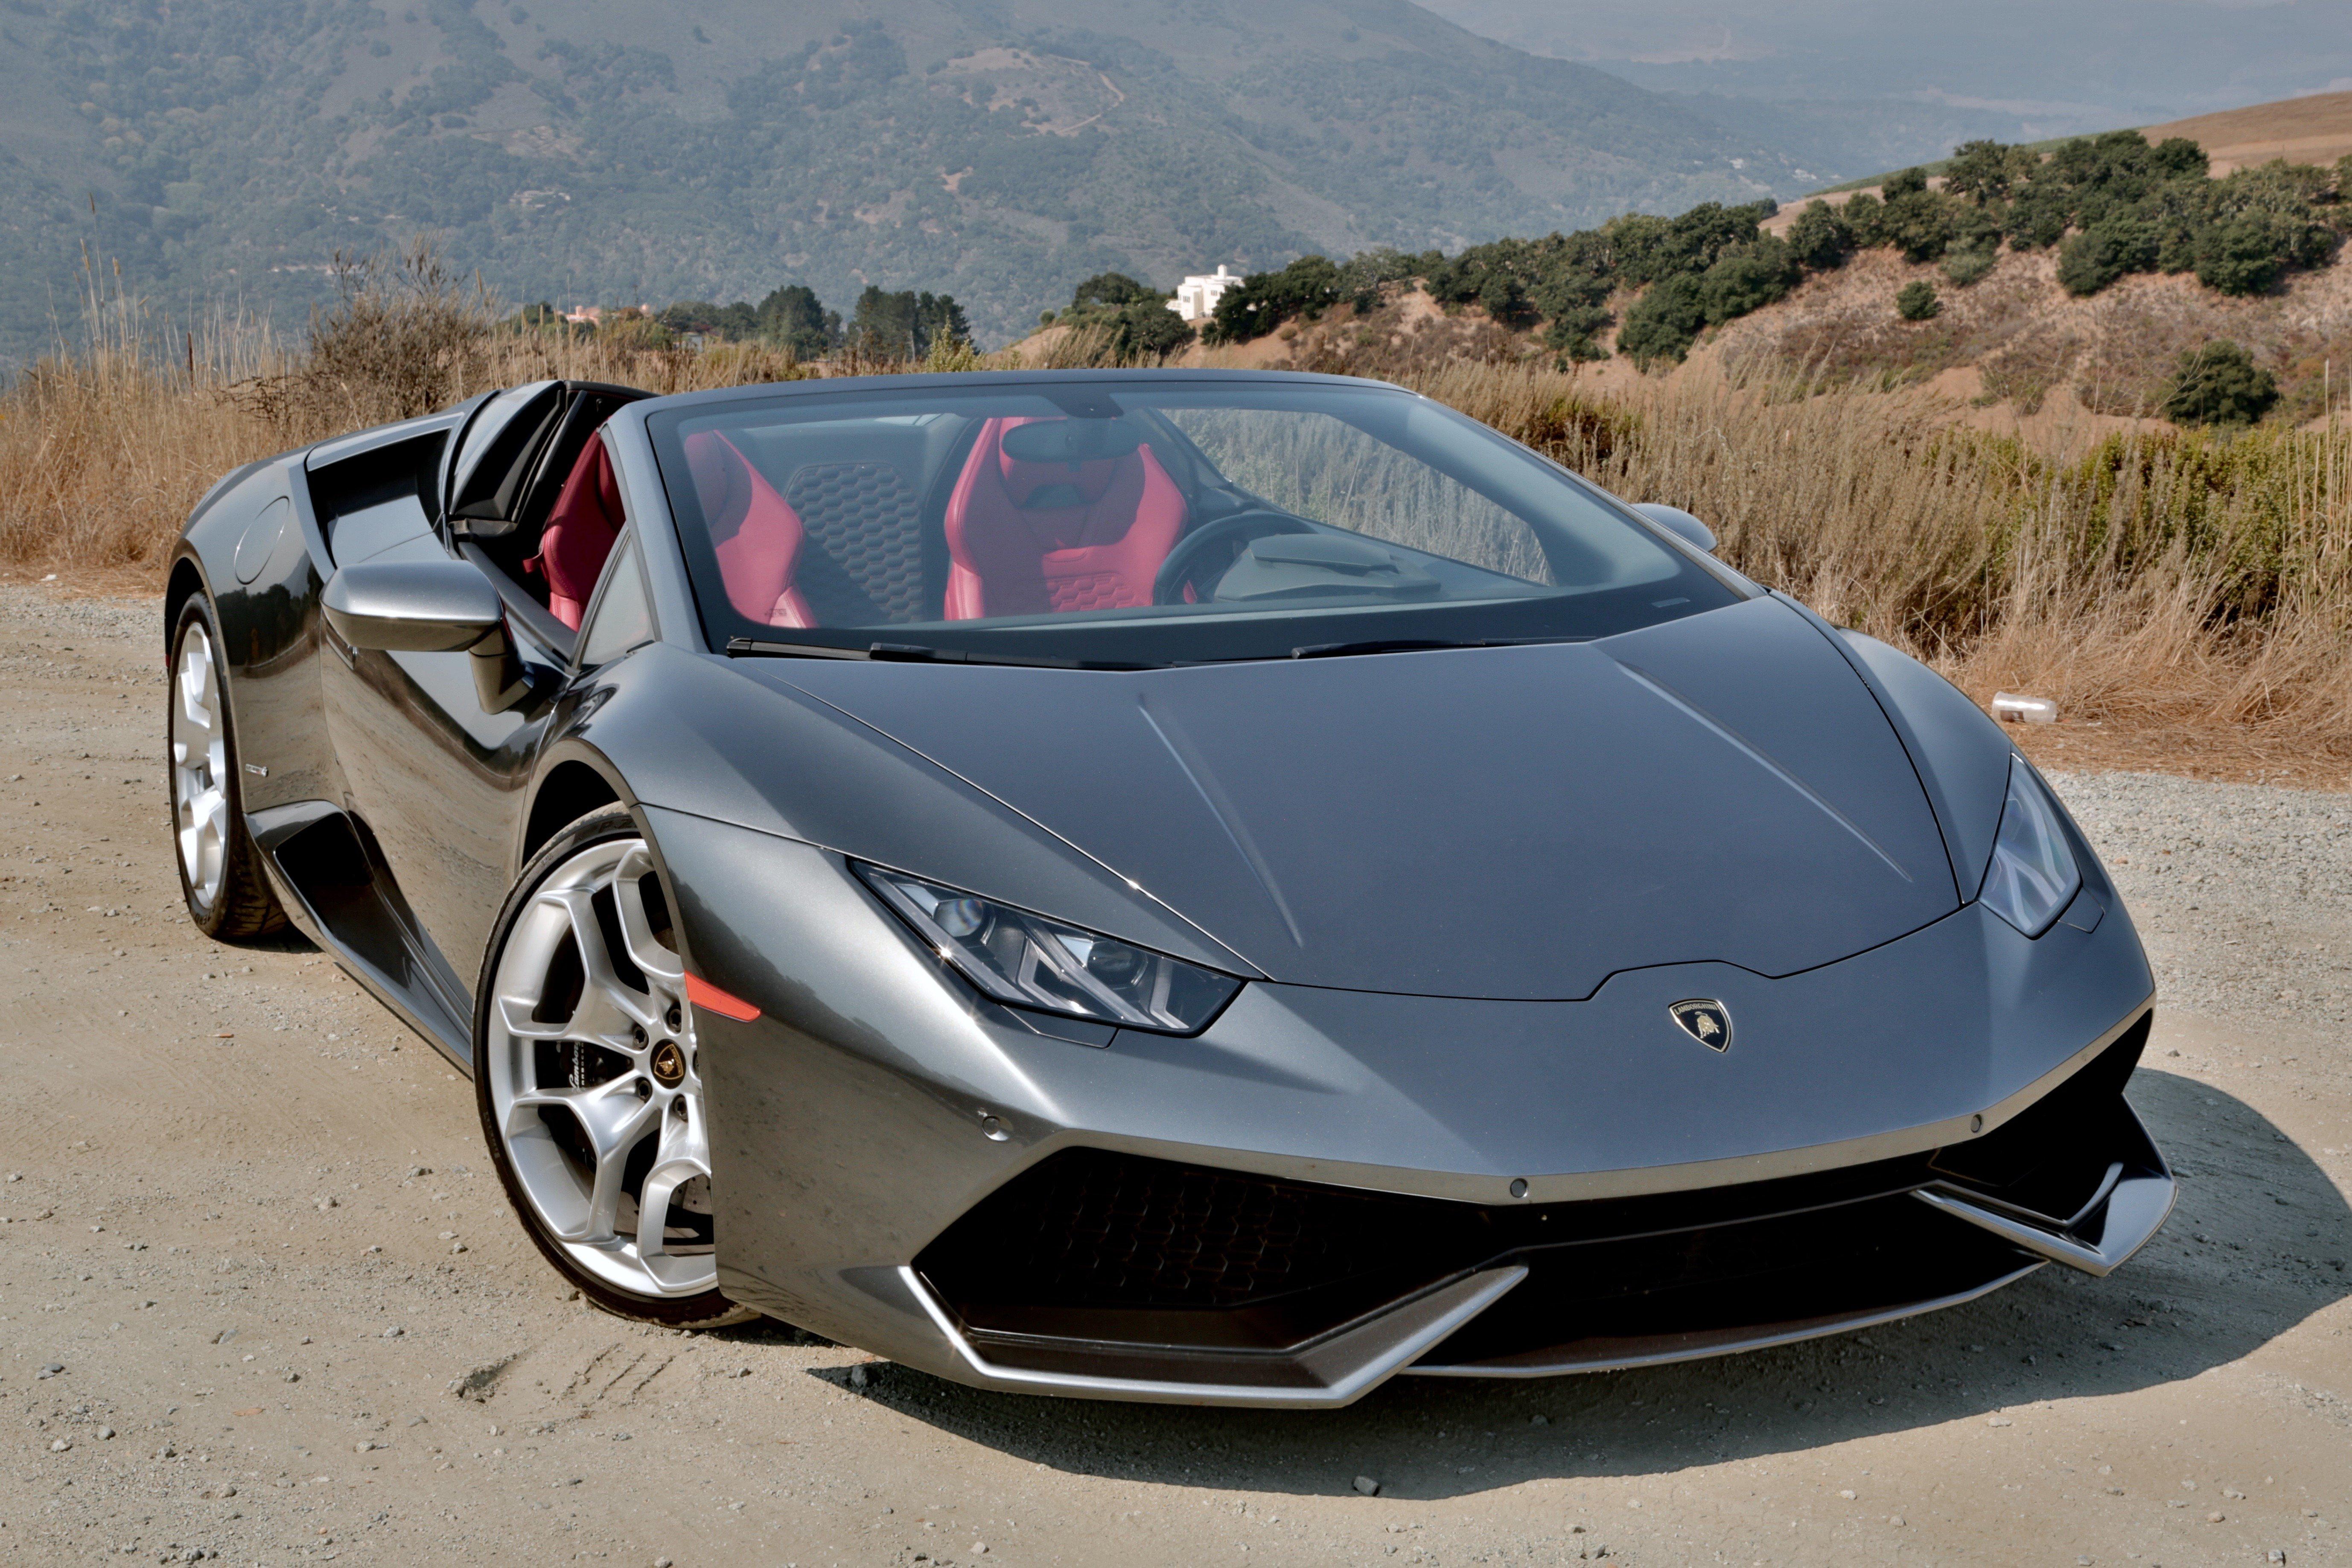 2016-Lamborghini-Huracan-LP-610-4-Spyder-Review-1